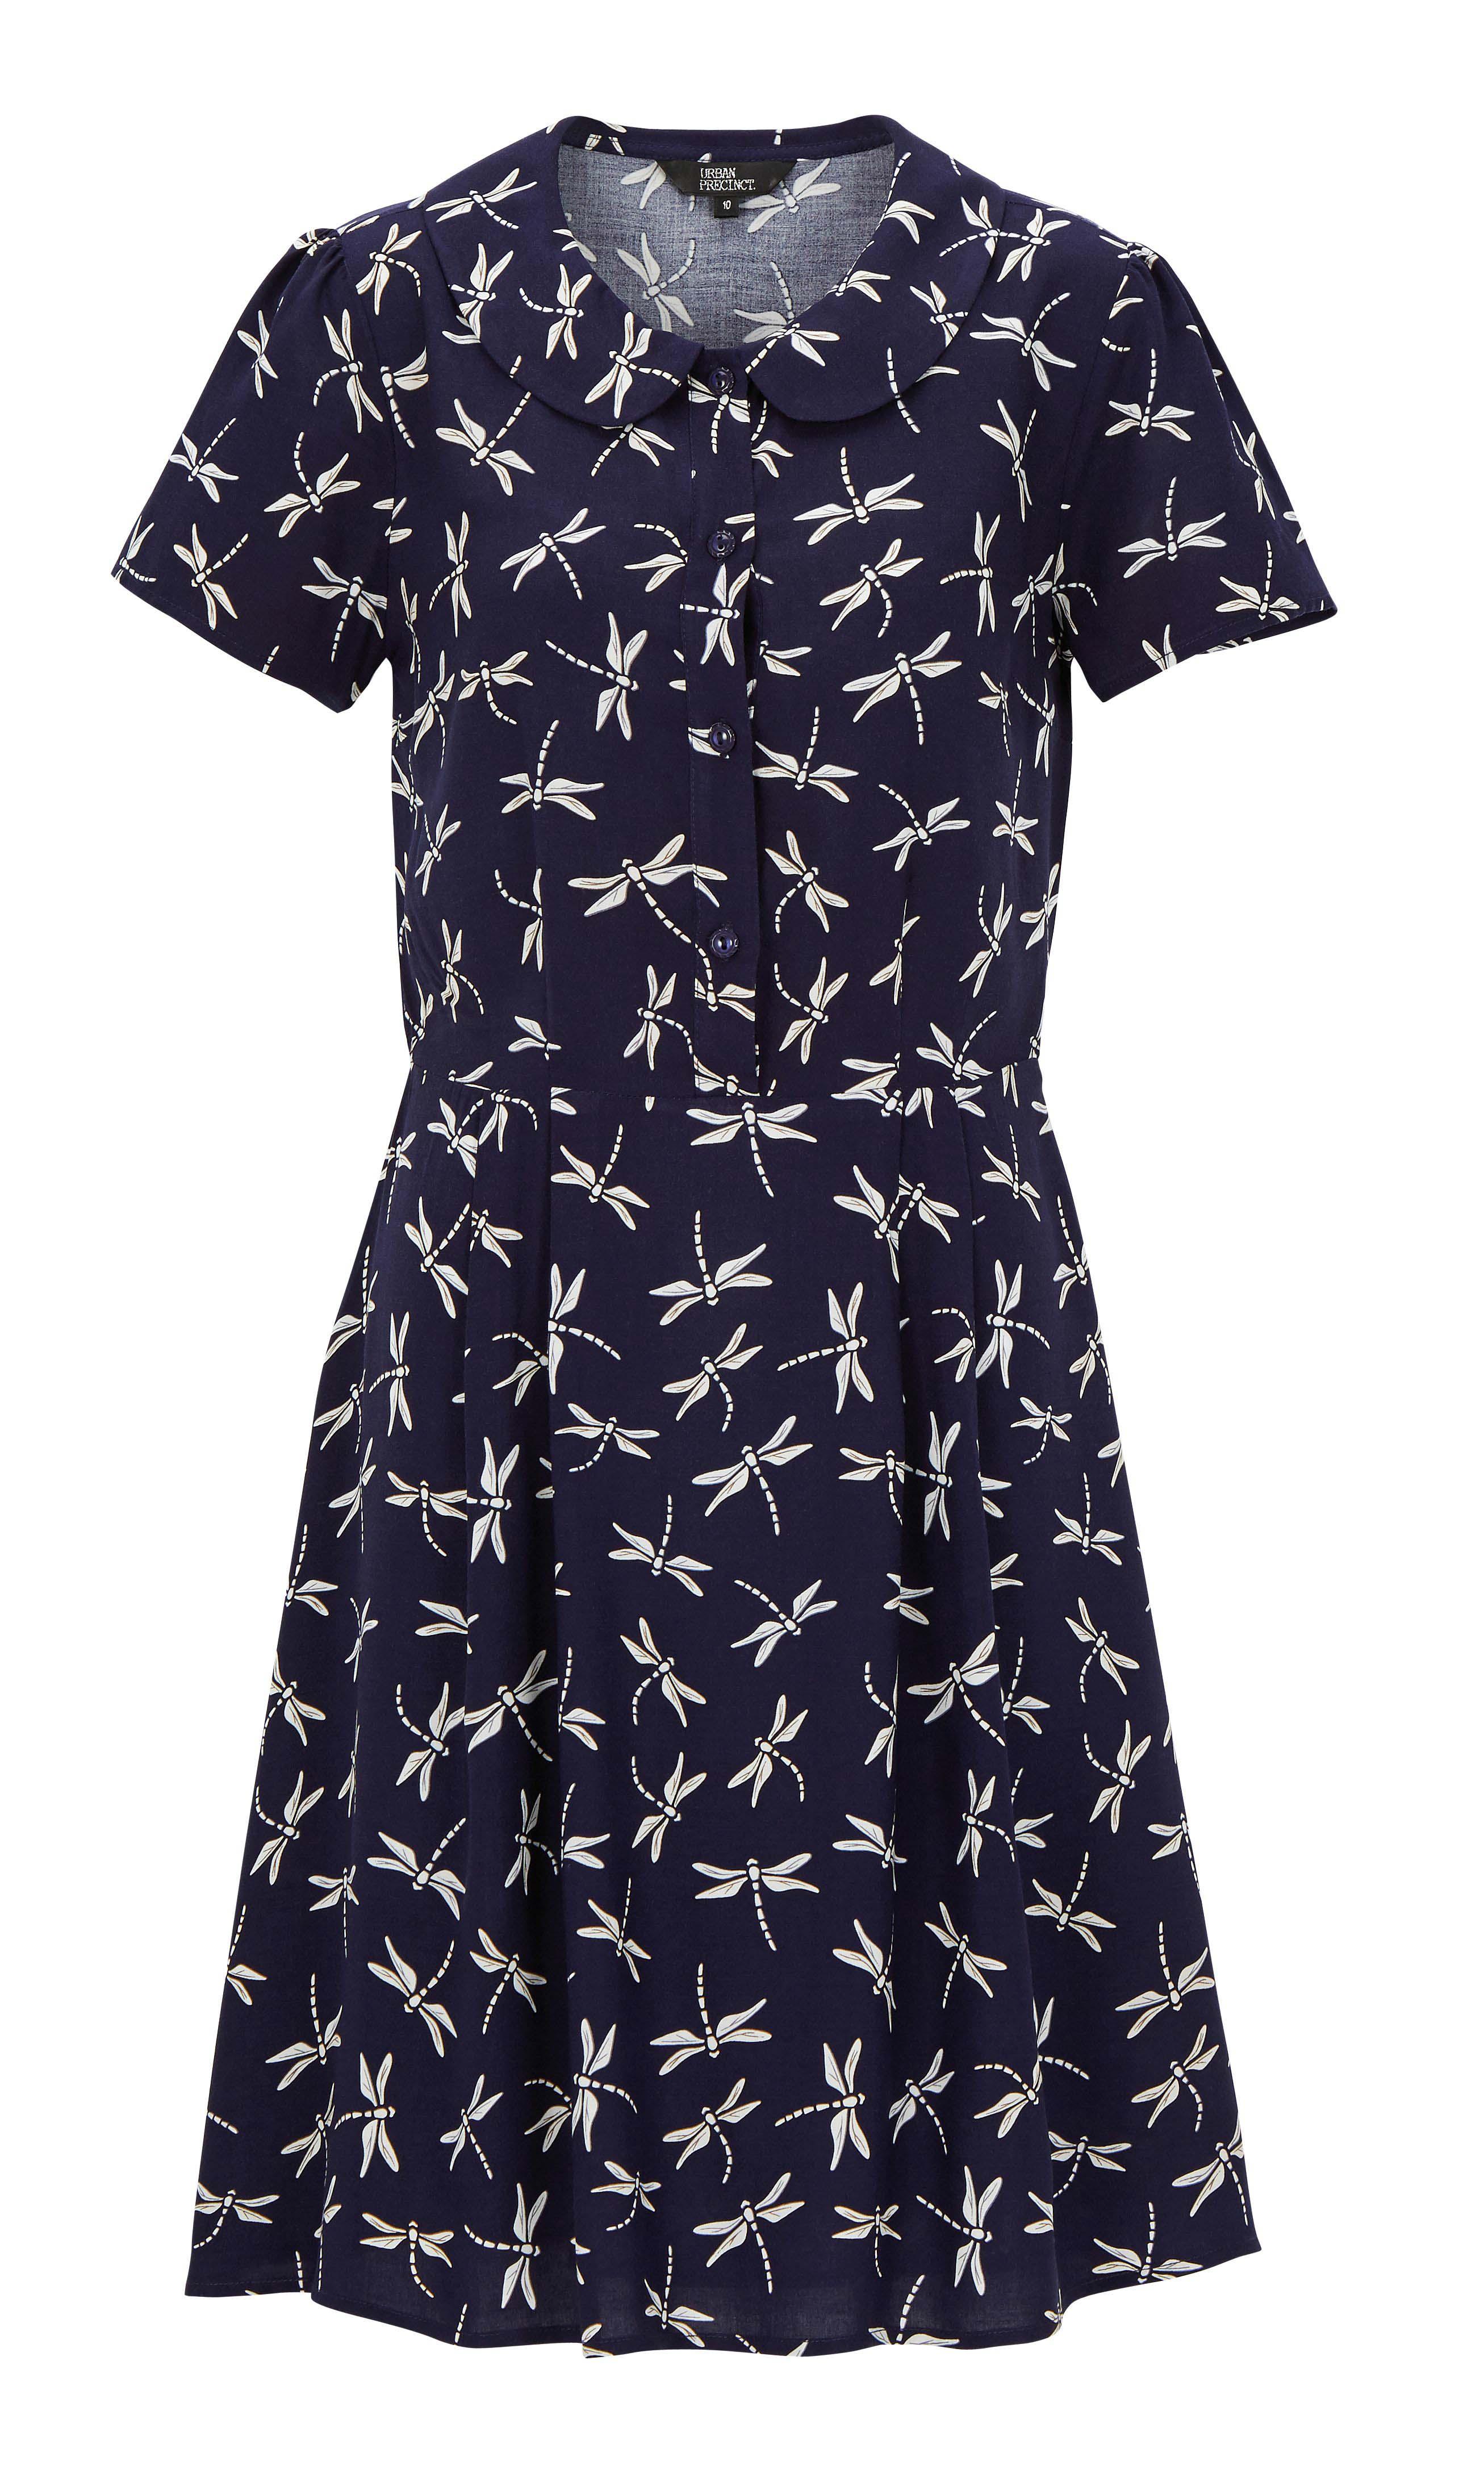 6065782 Urban Precinct Up Shirt Dress $79.99 Instore Feb 15 2016